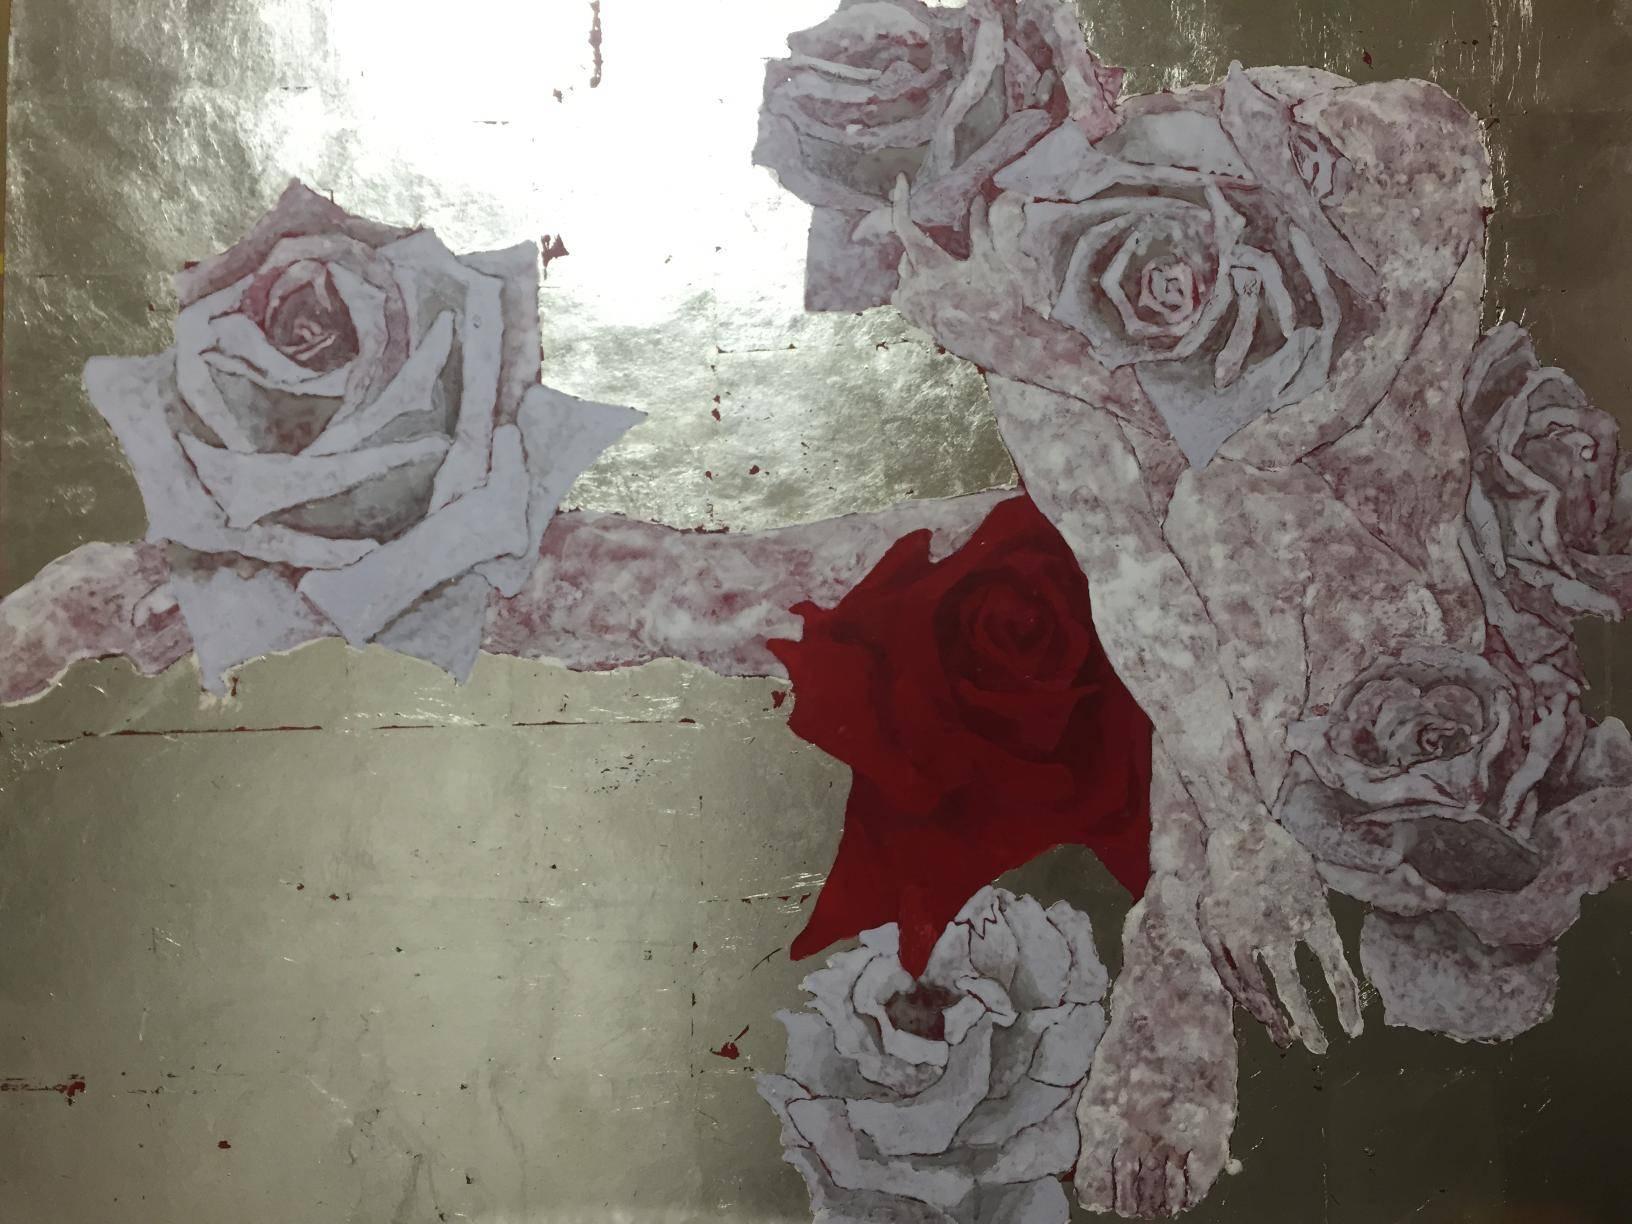 sin & rose